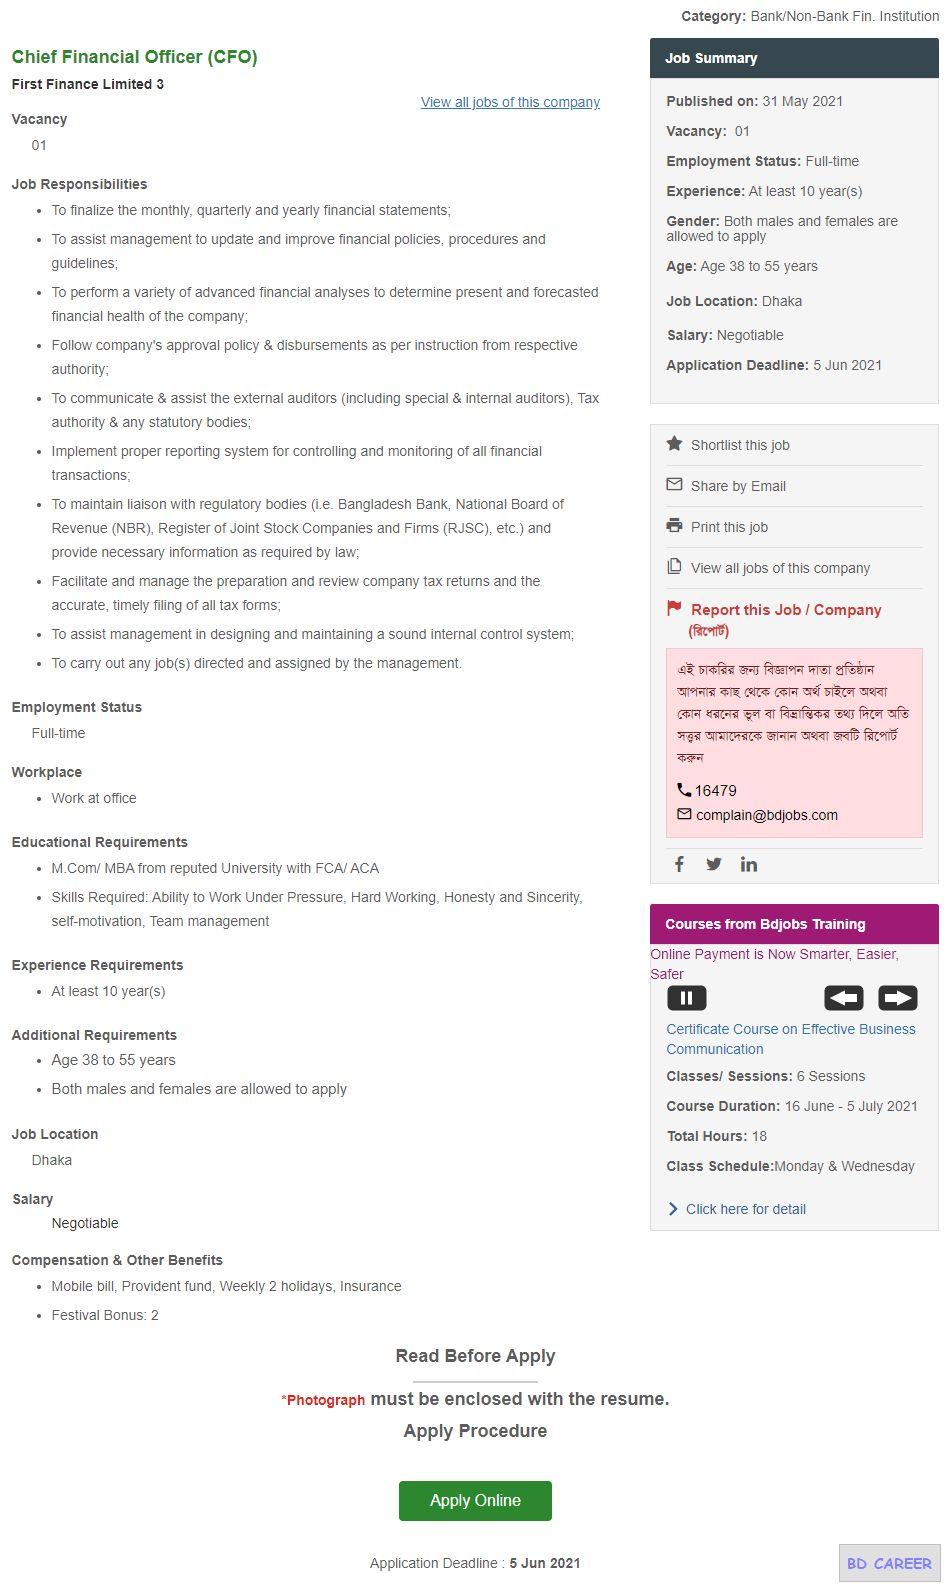 Chief Financial Officer (CFO) _ First Finance Limited II Bdjobs_com